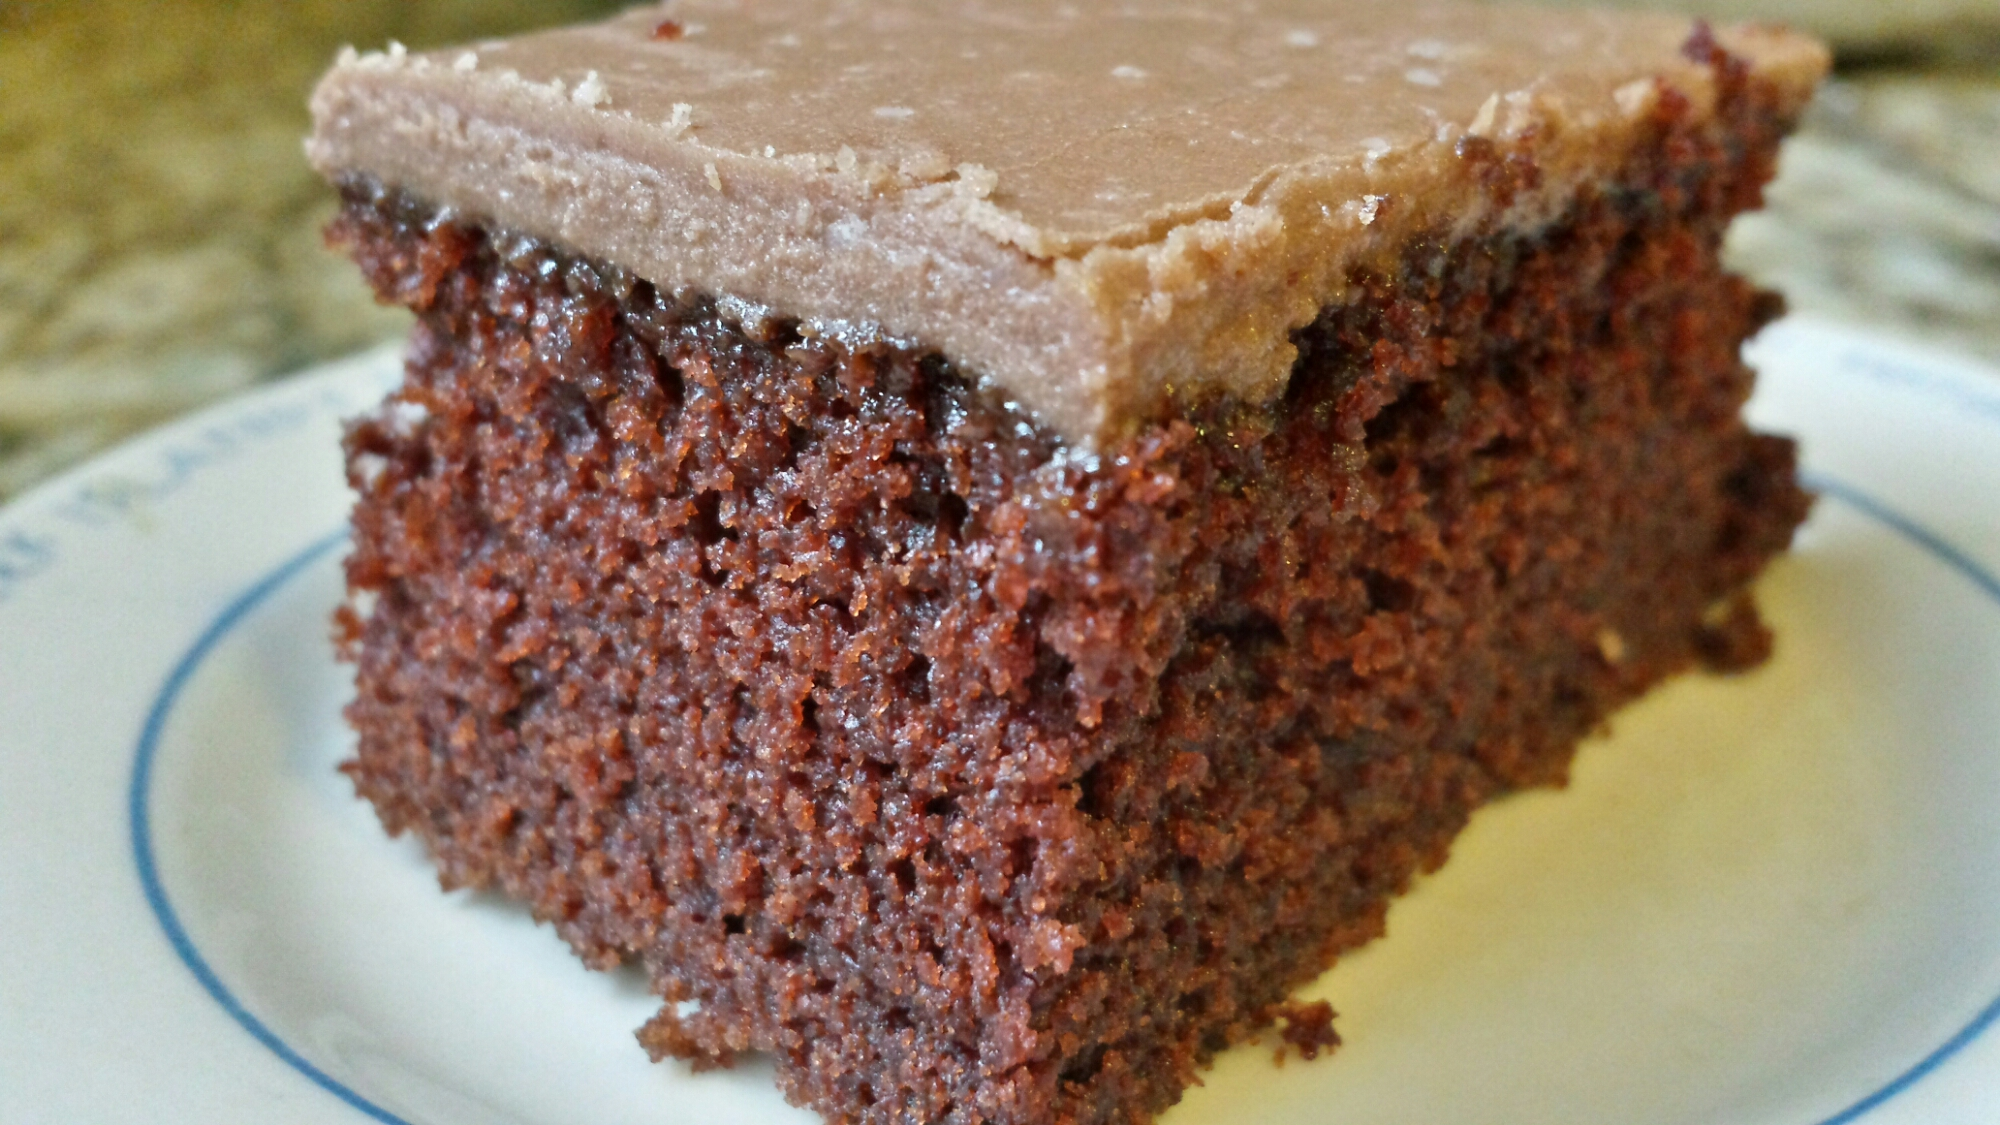 Vegan Chocolate Mayonnaise Cake | Avocados and Ales